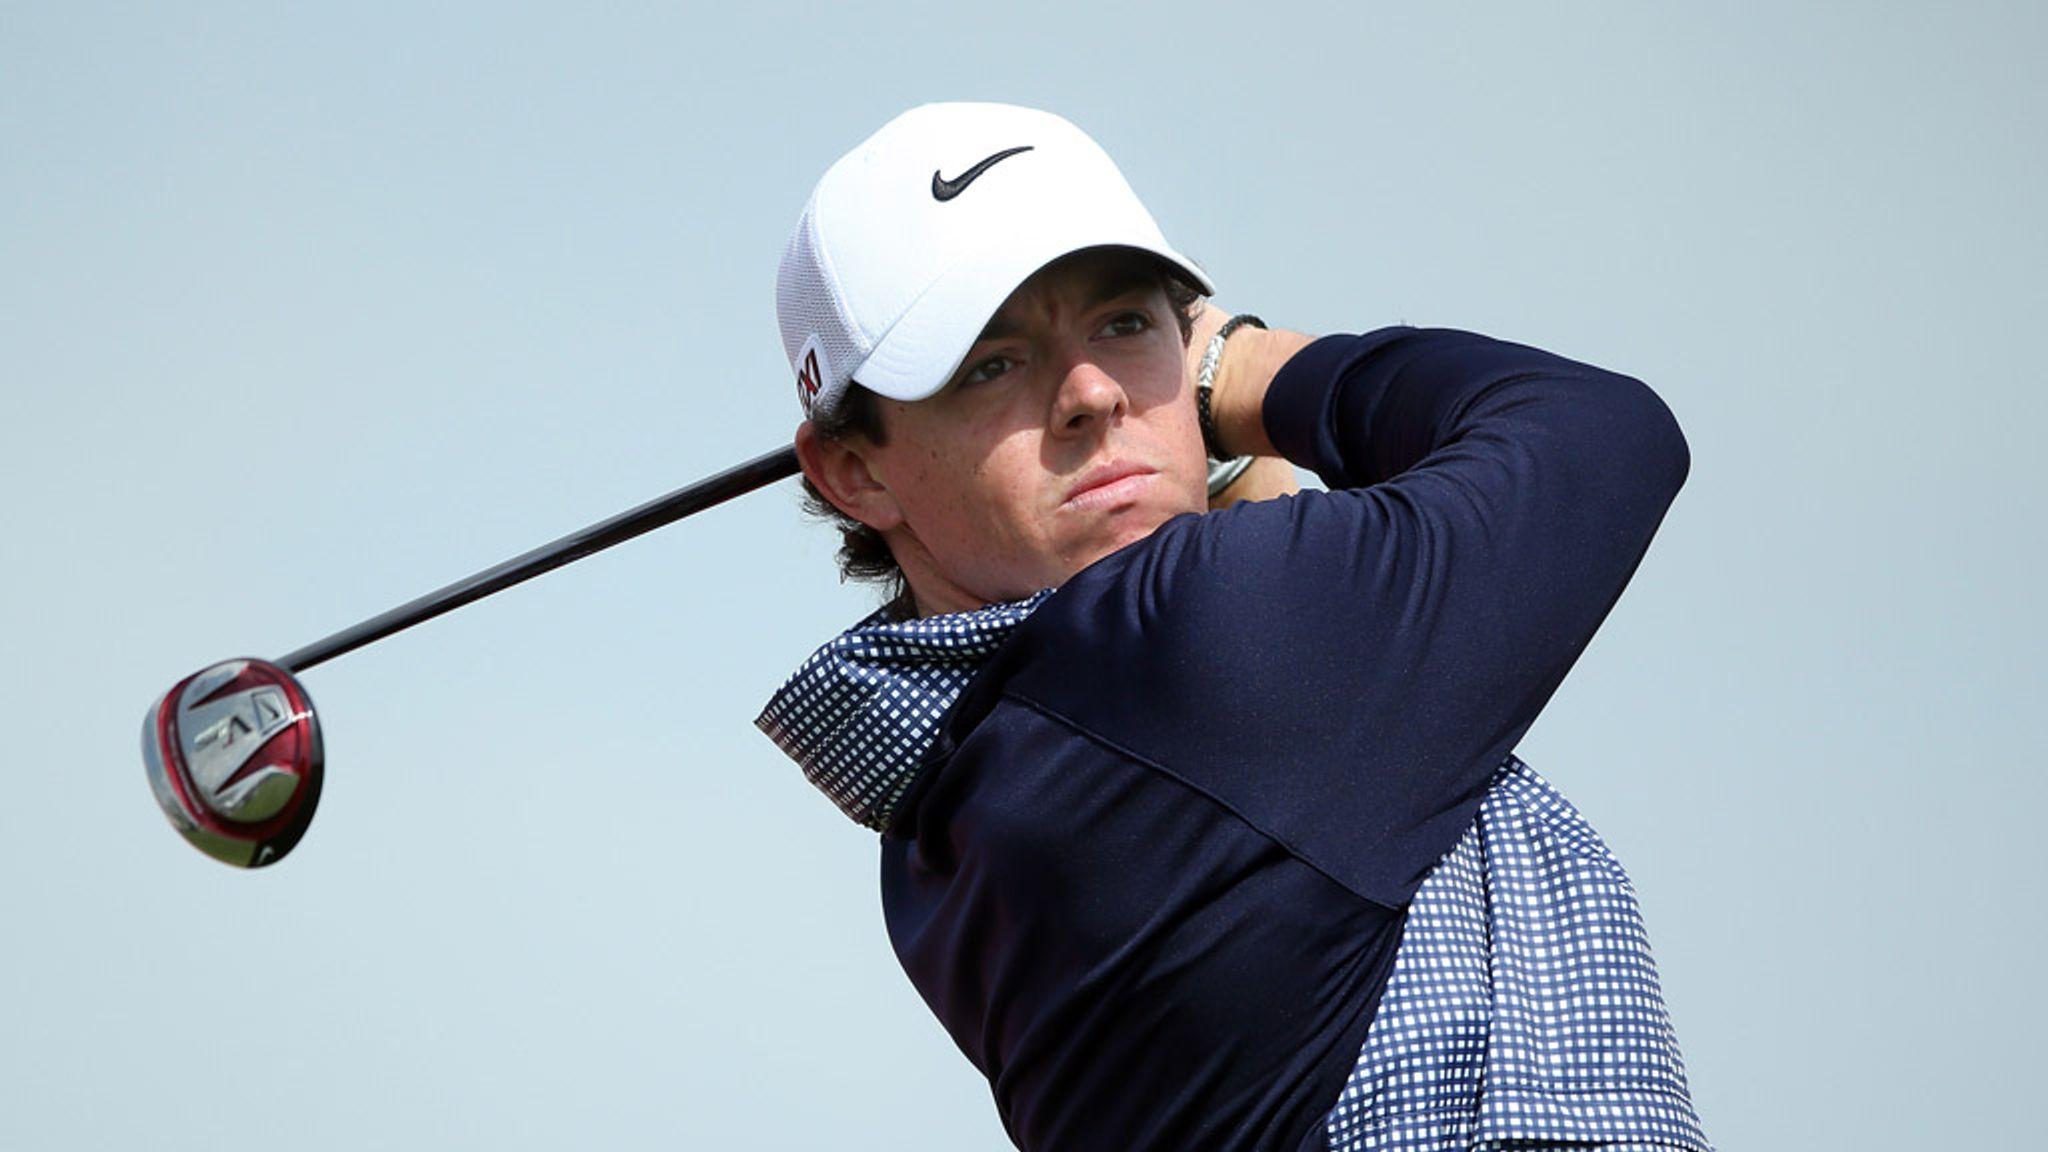 Race to dubai golf betting apps binary options trading demo account